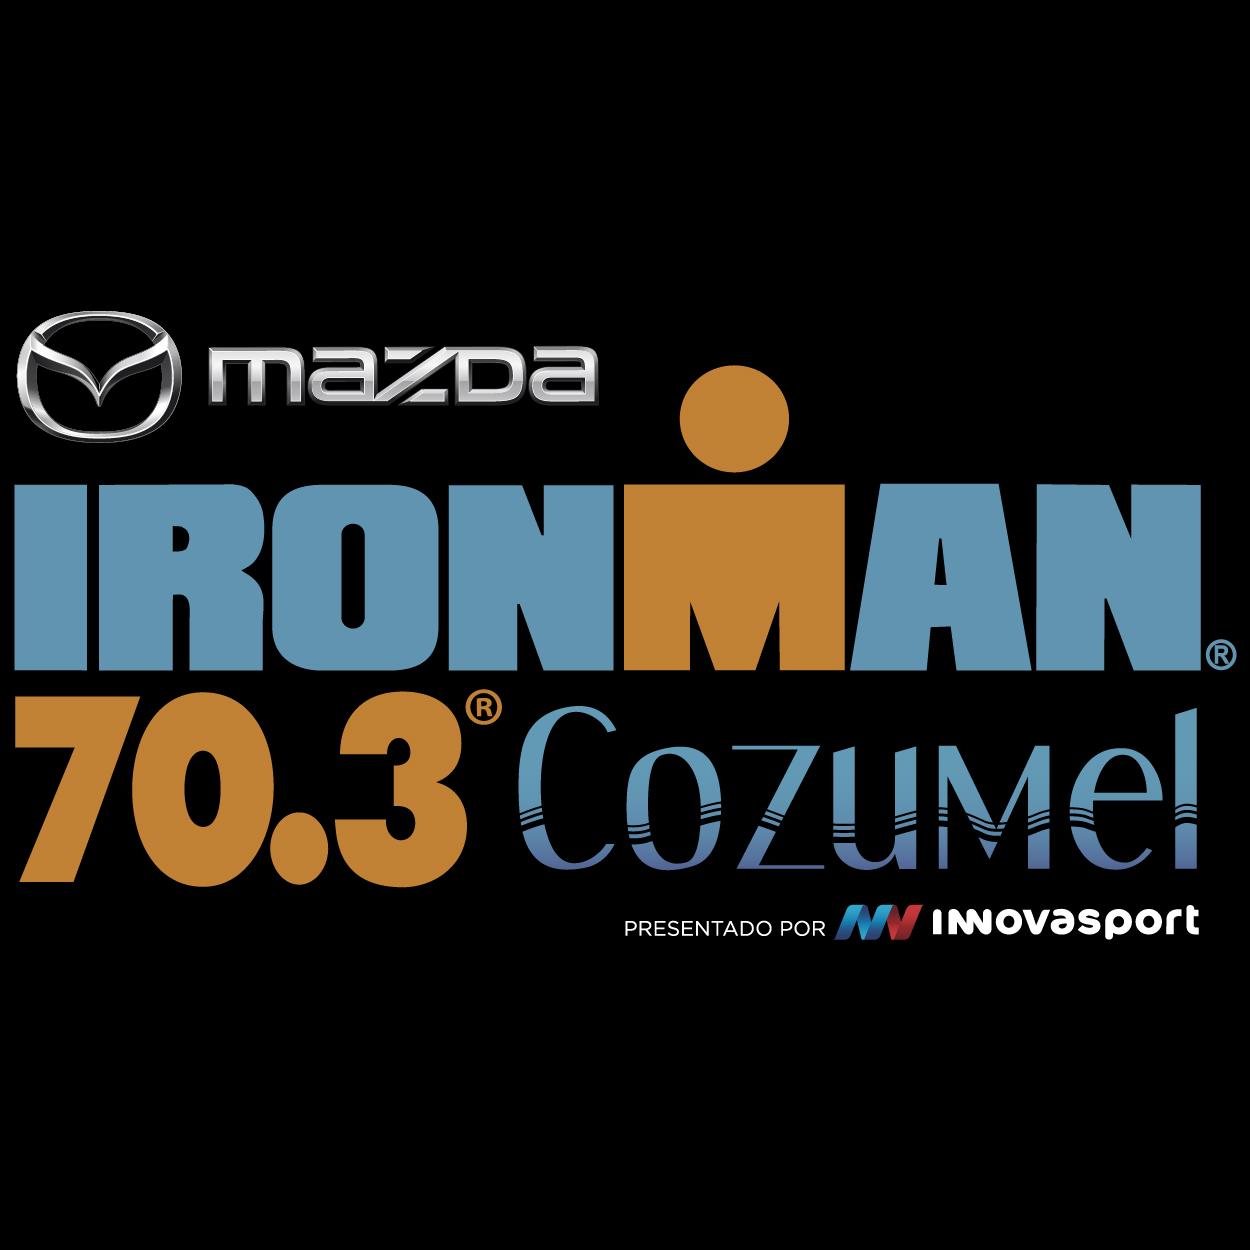 MAZDA IRONMAN 70.3 Cozumel 2020